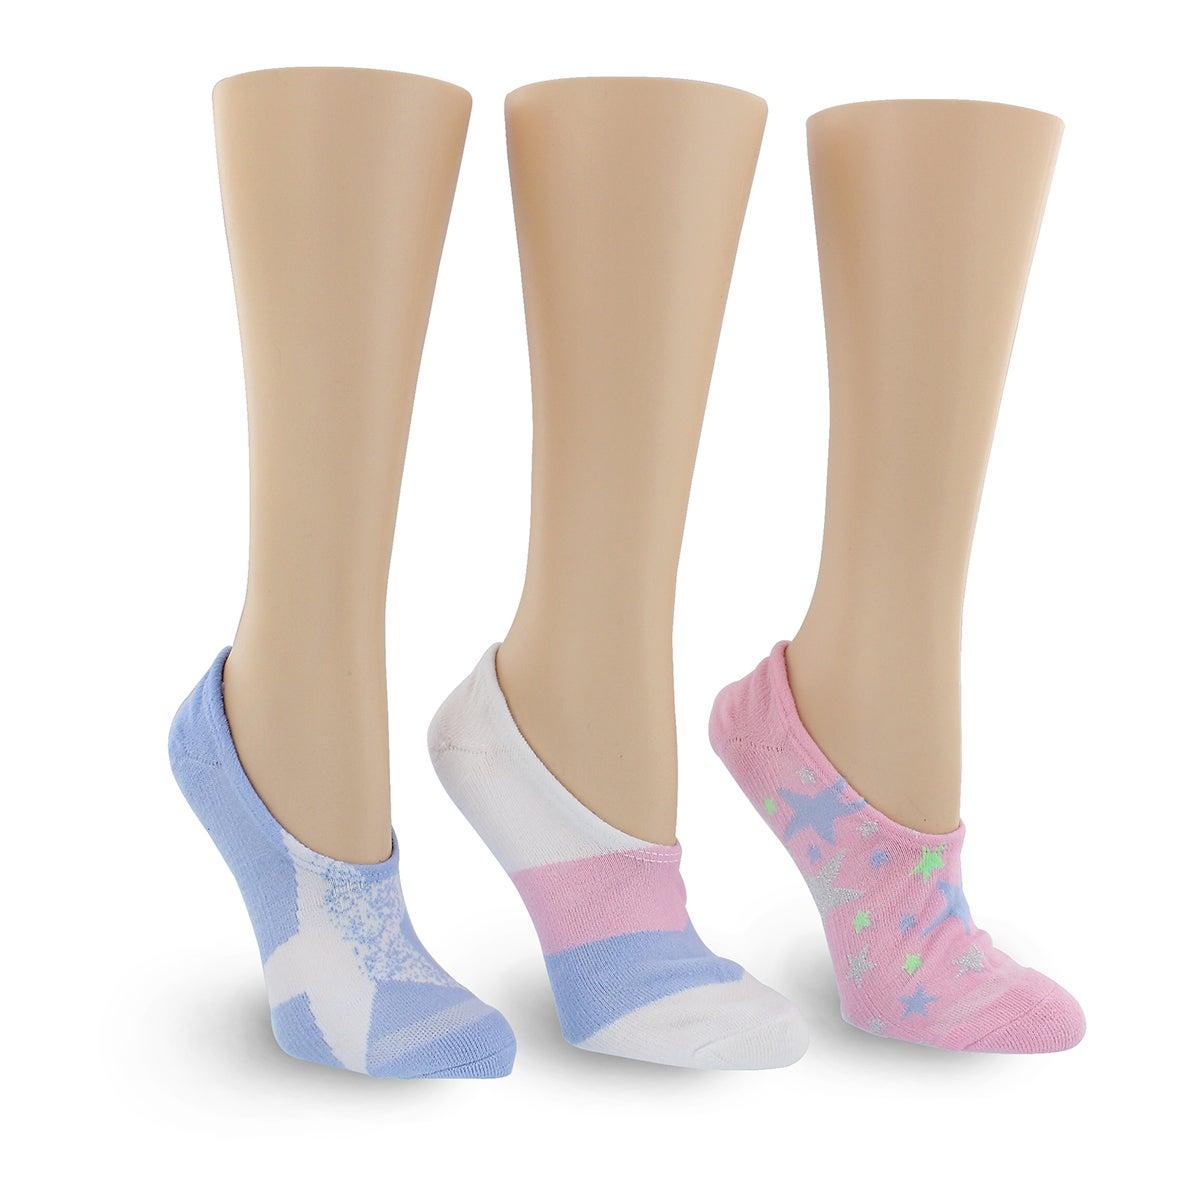 Lds Super Stahh multi sock- 3 pak